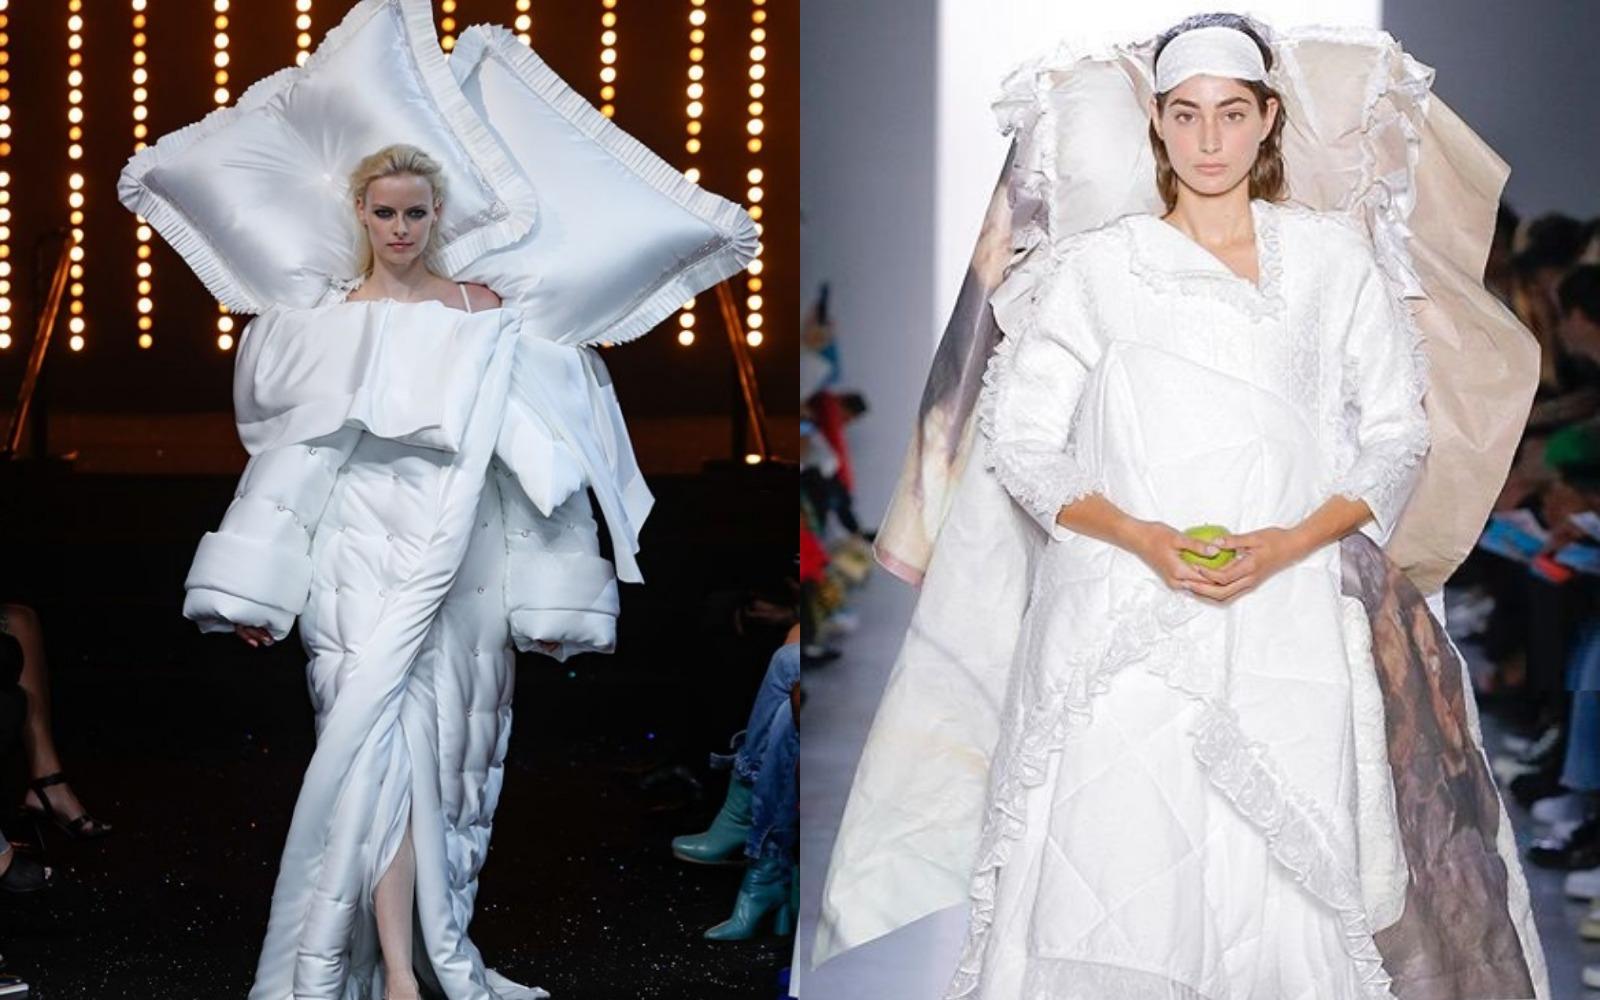 Uups! Viktor & Rolf vs. Parsons MFA Design